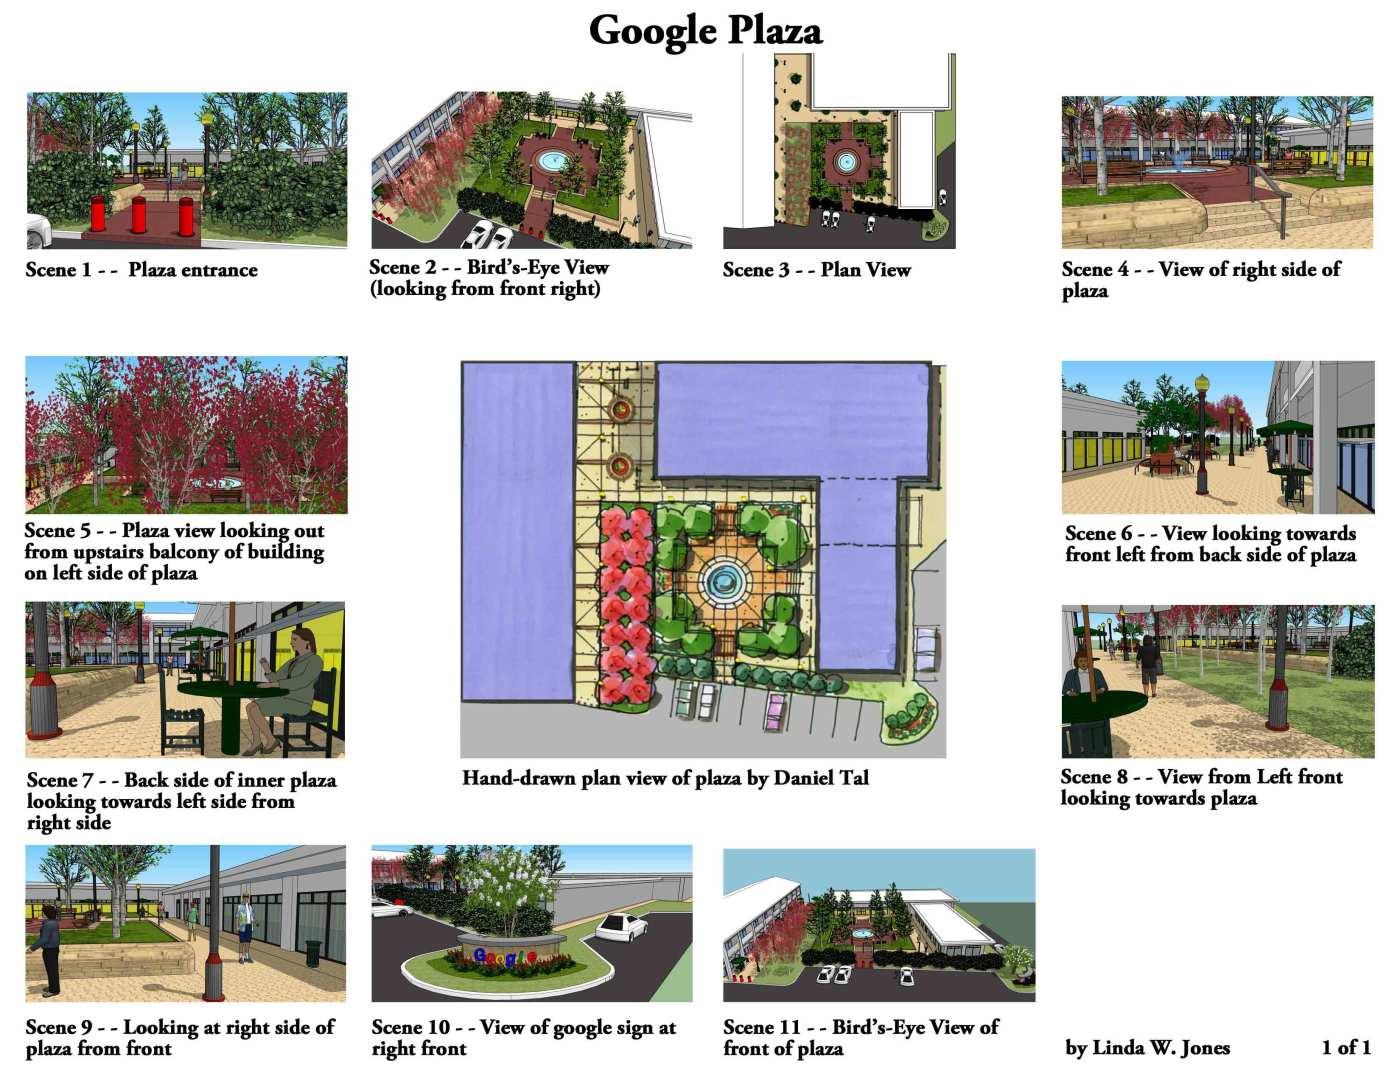 2.-Google-Plaza-lr-082715